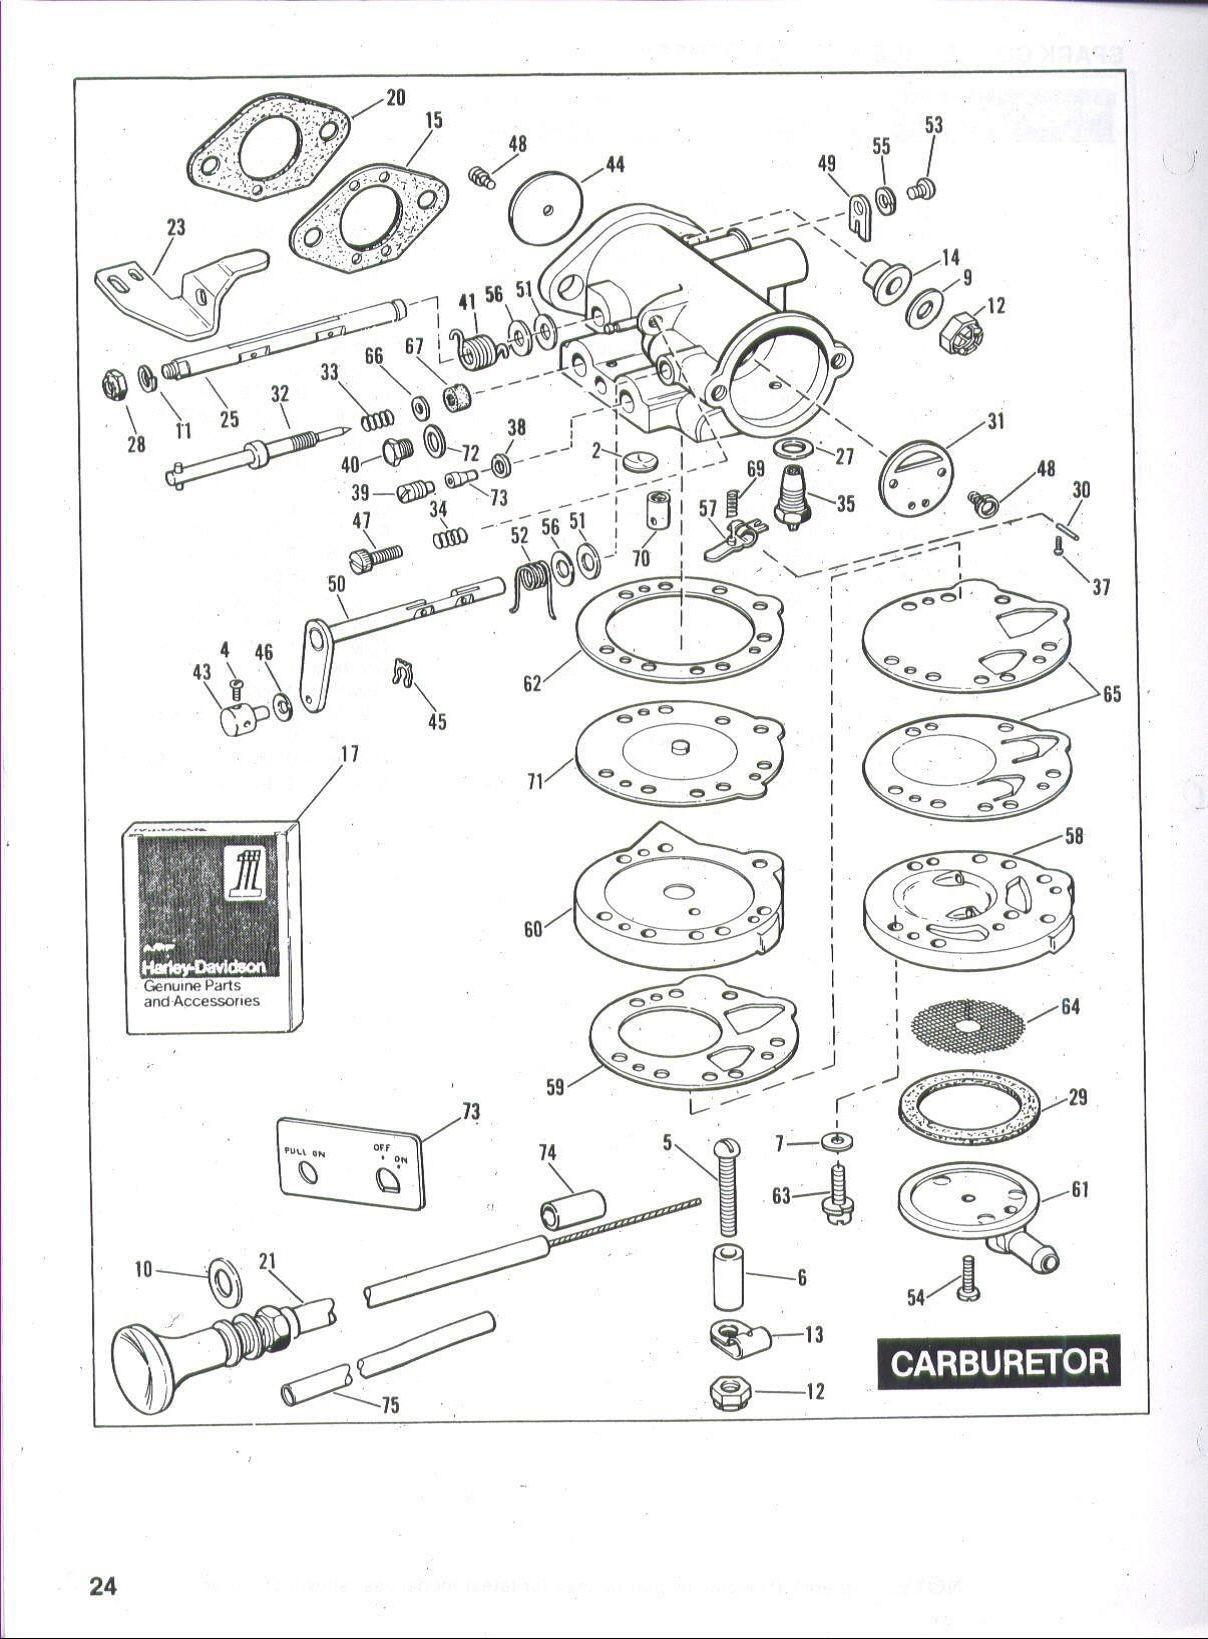 Club Car Parts Diagram Harley Davidson Golf Cart